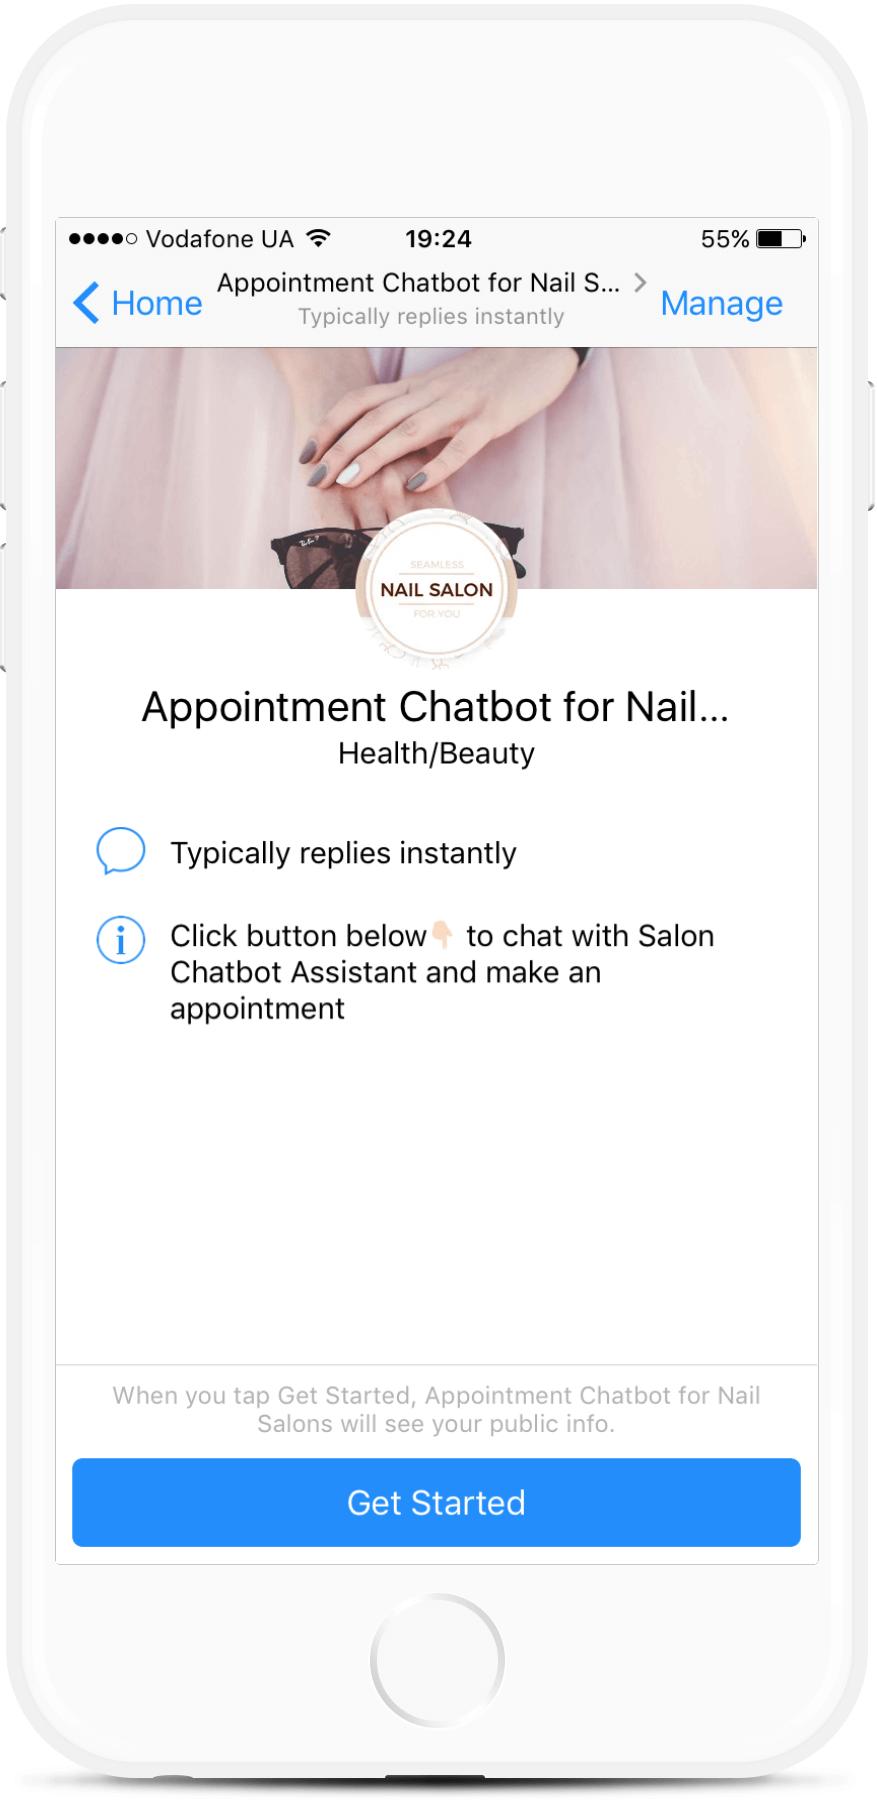 Facebook Messenger Appointment Chatbot for Nail Salons for $49   #messenger #bottemplates #bots #chatbots #aibots #fbmessenger #botmakers